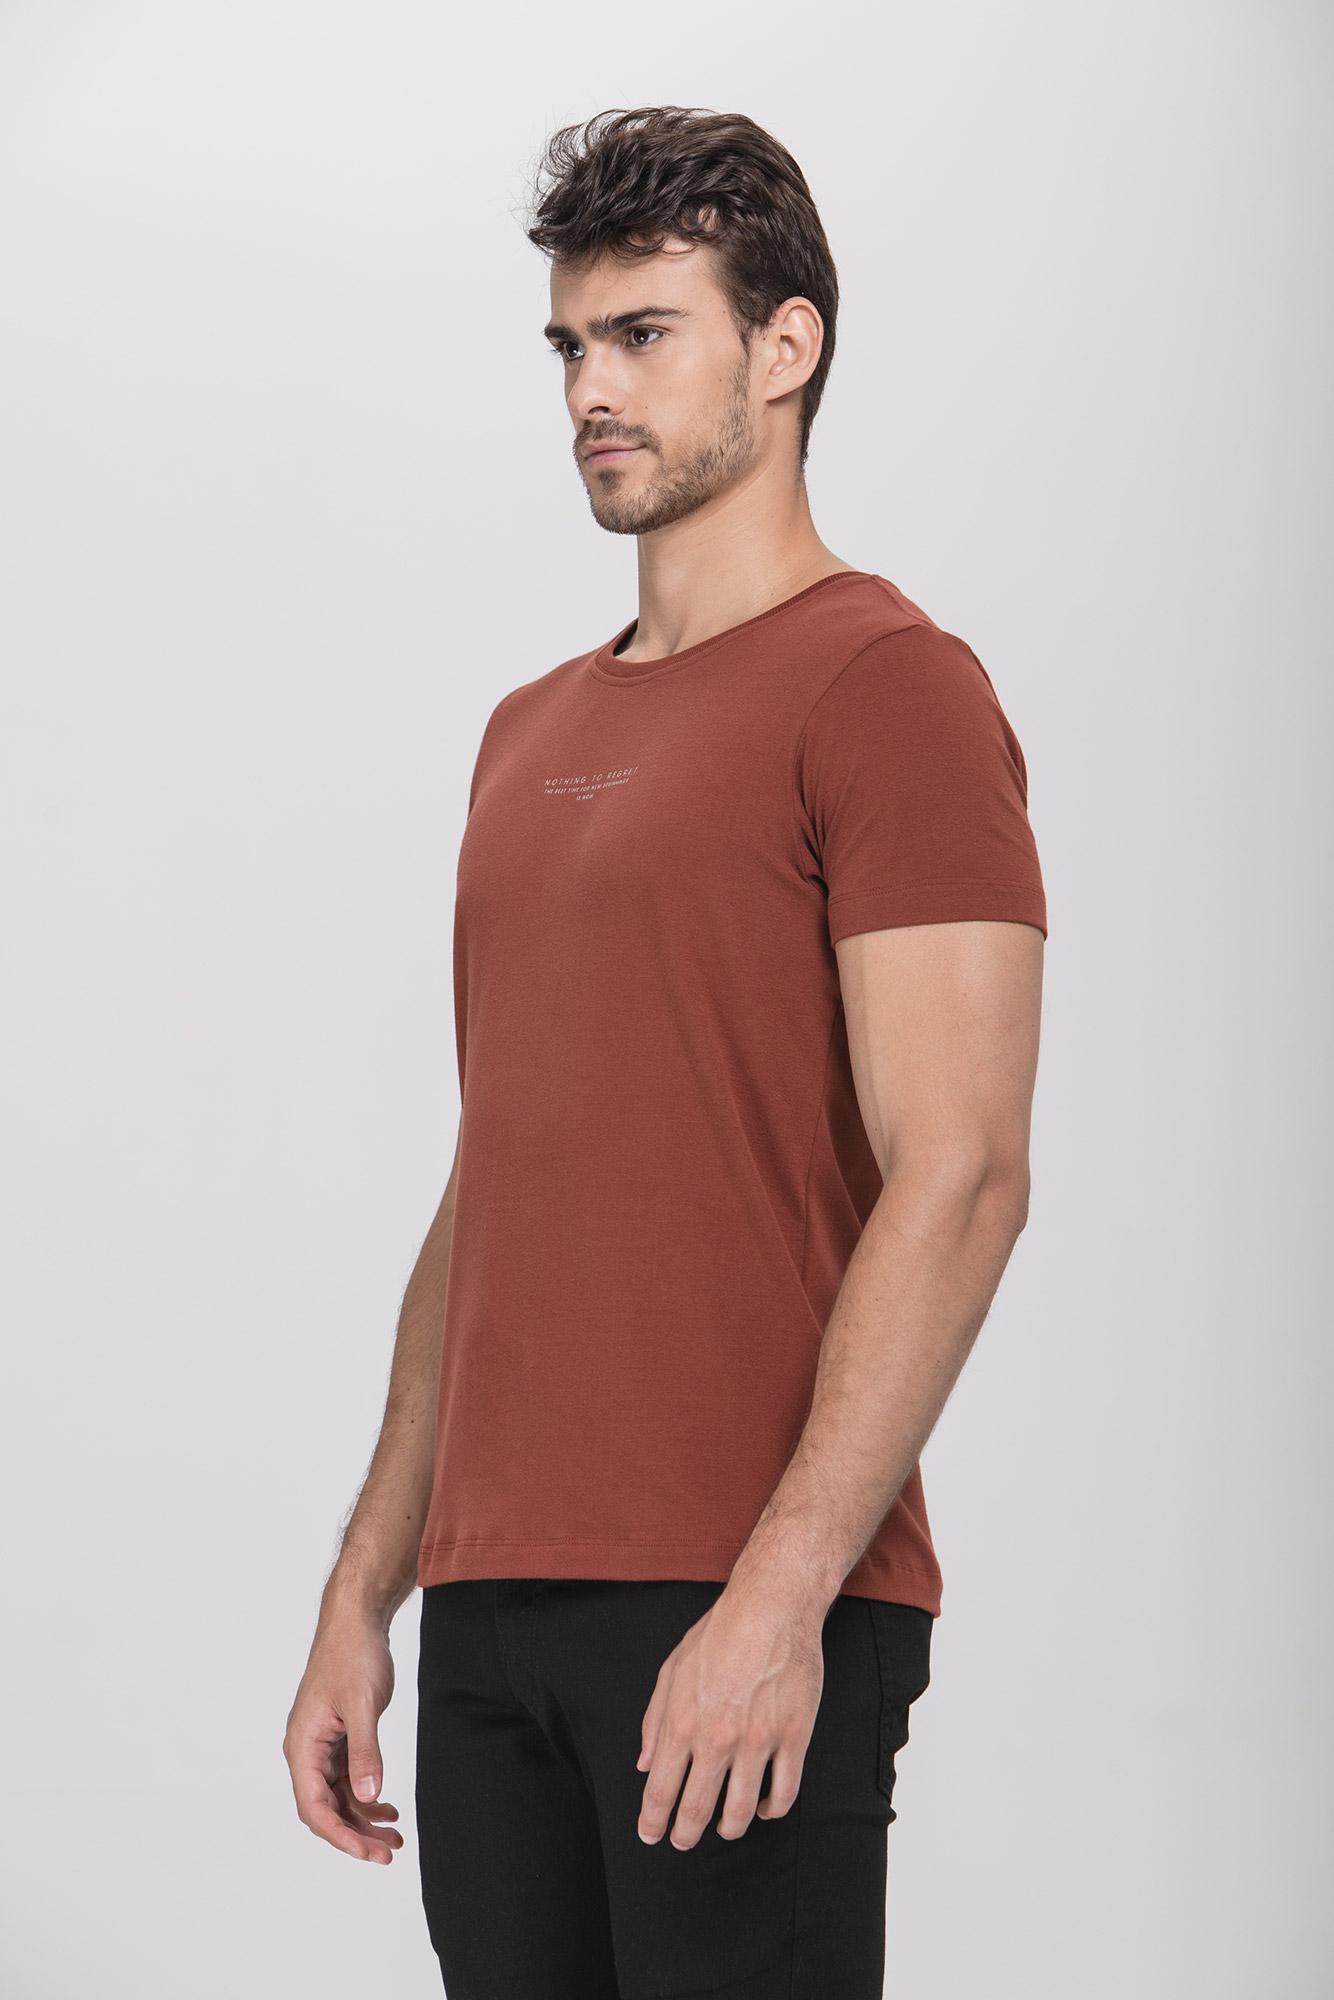 Camiseta Nothing To Regret Bordô